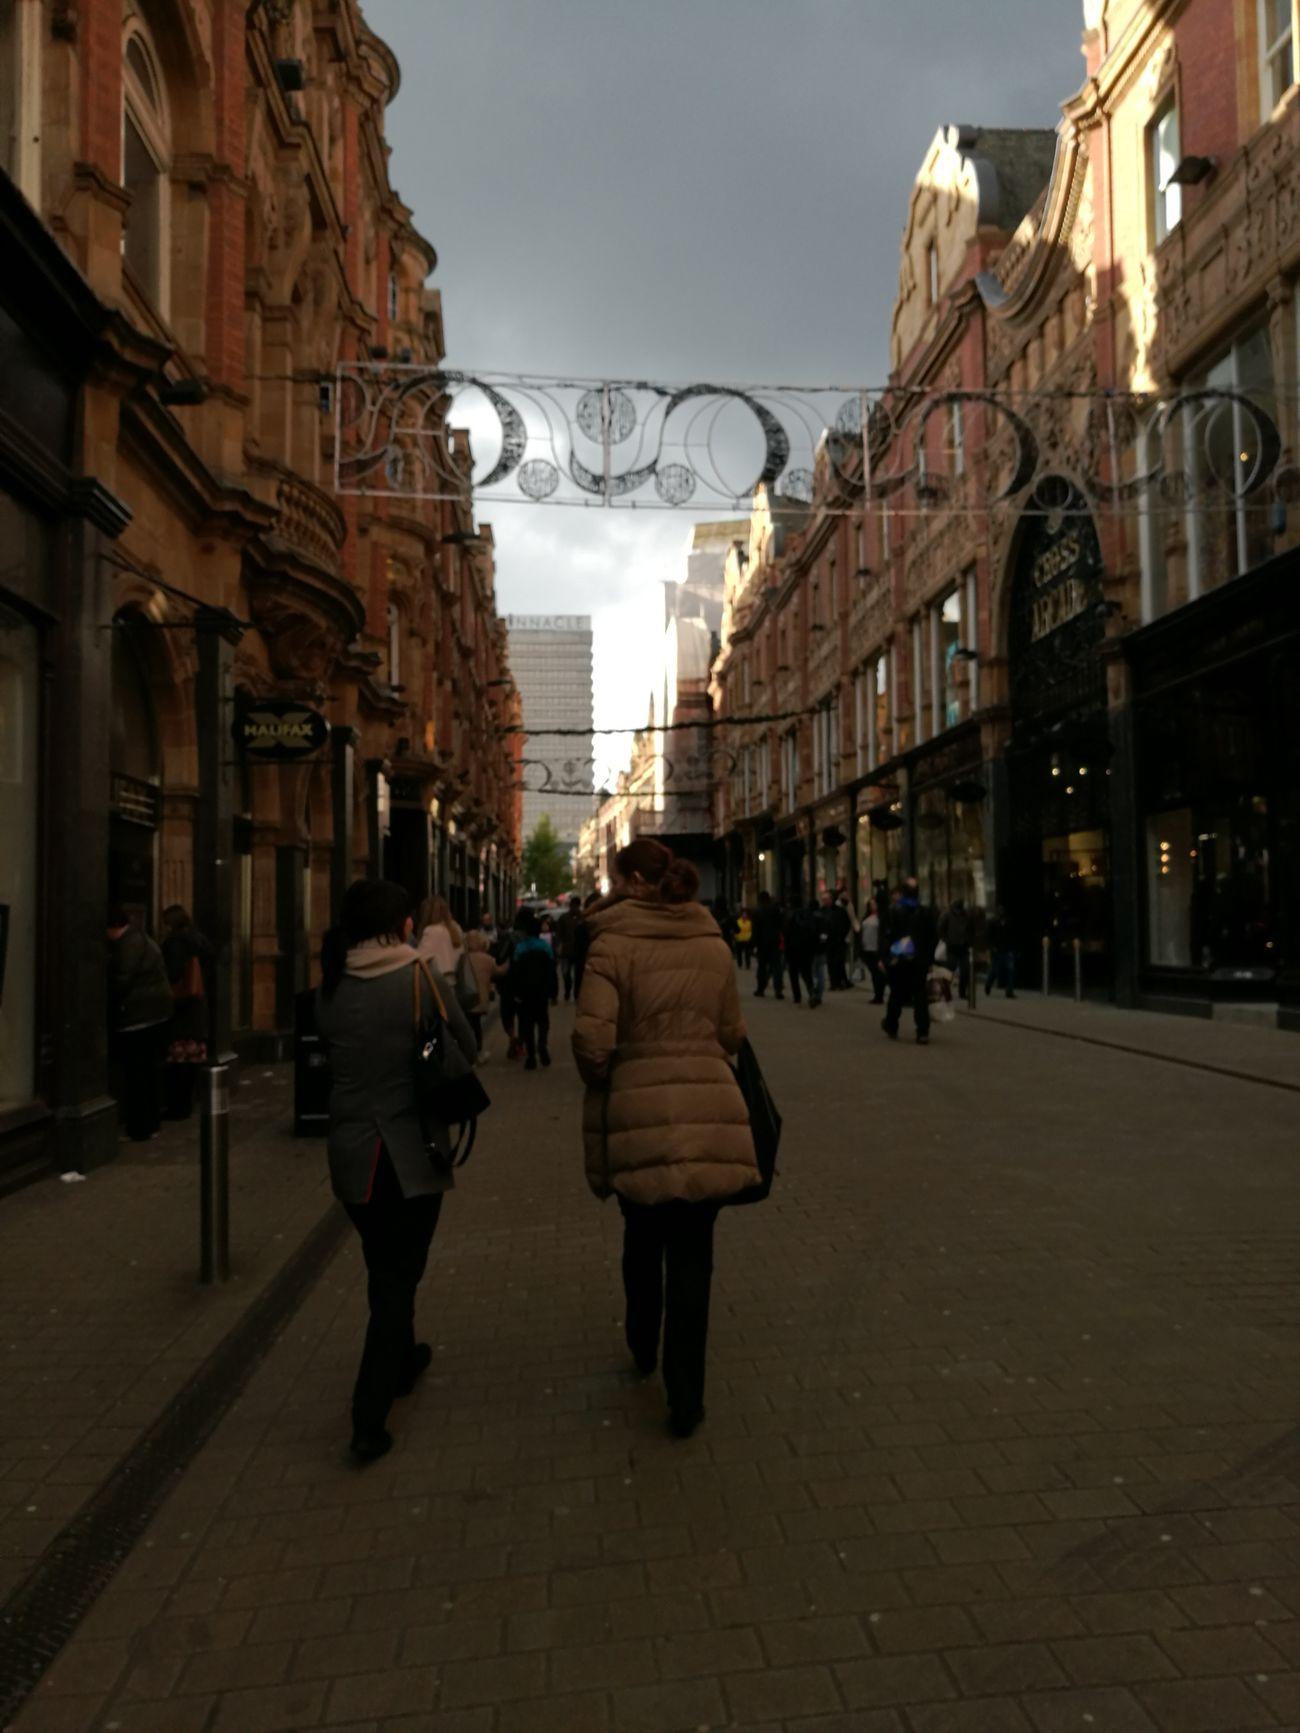 City Street Streetviewphotography Street Photography Leedscitycentre